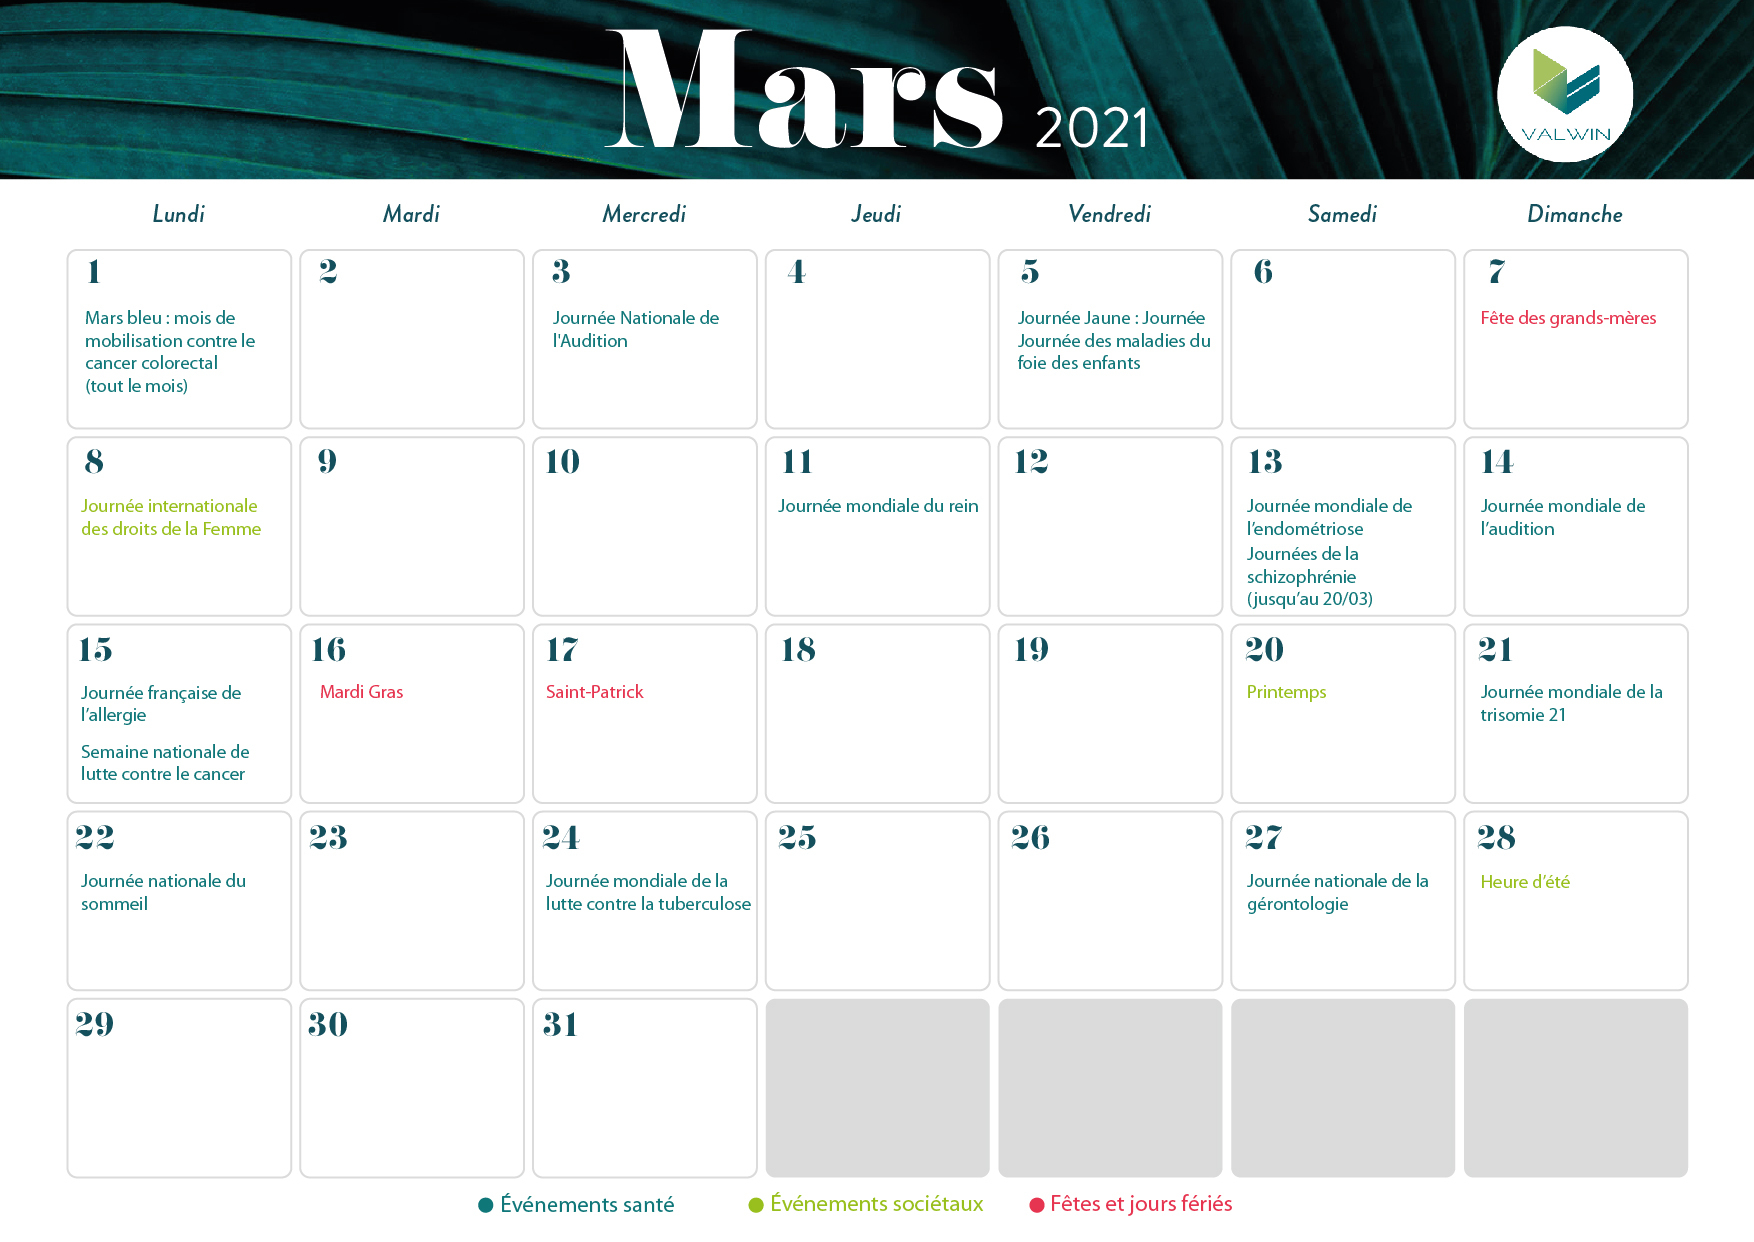 Mars-calendrier-journee-mondiale-sante-2021.jpg